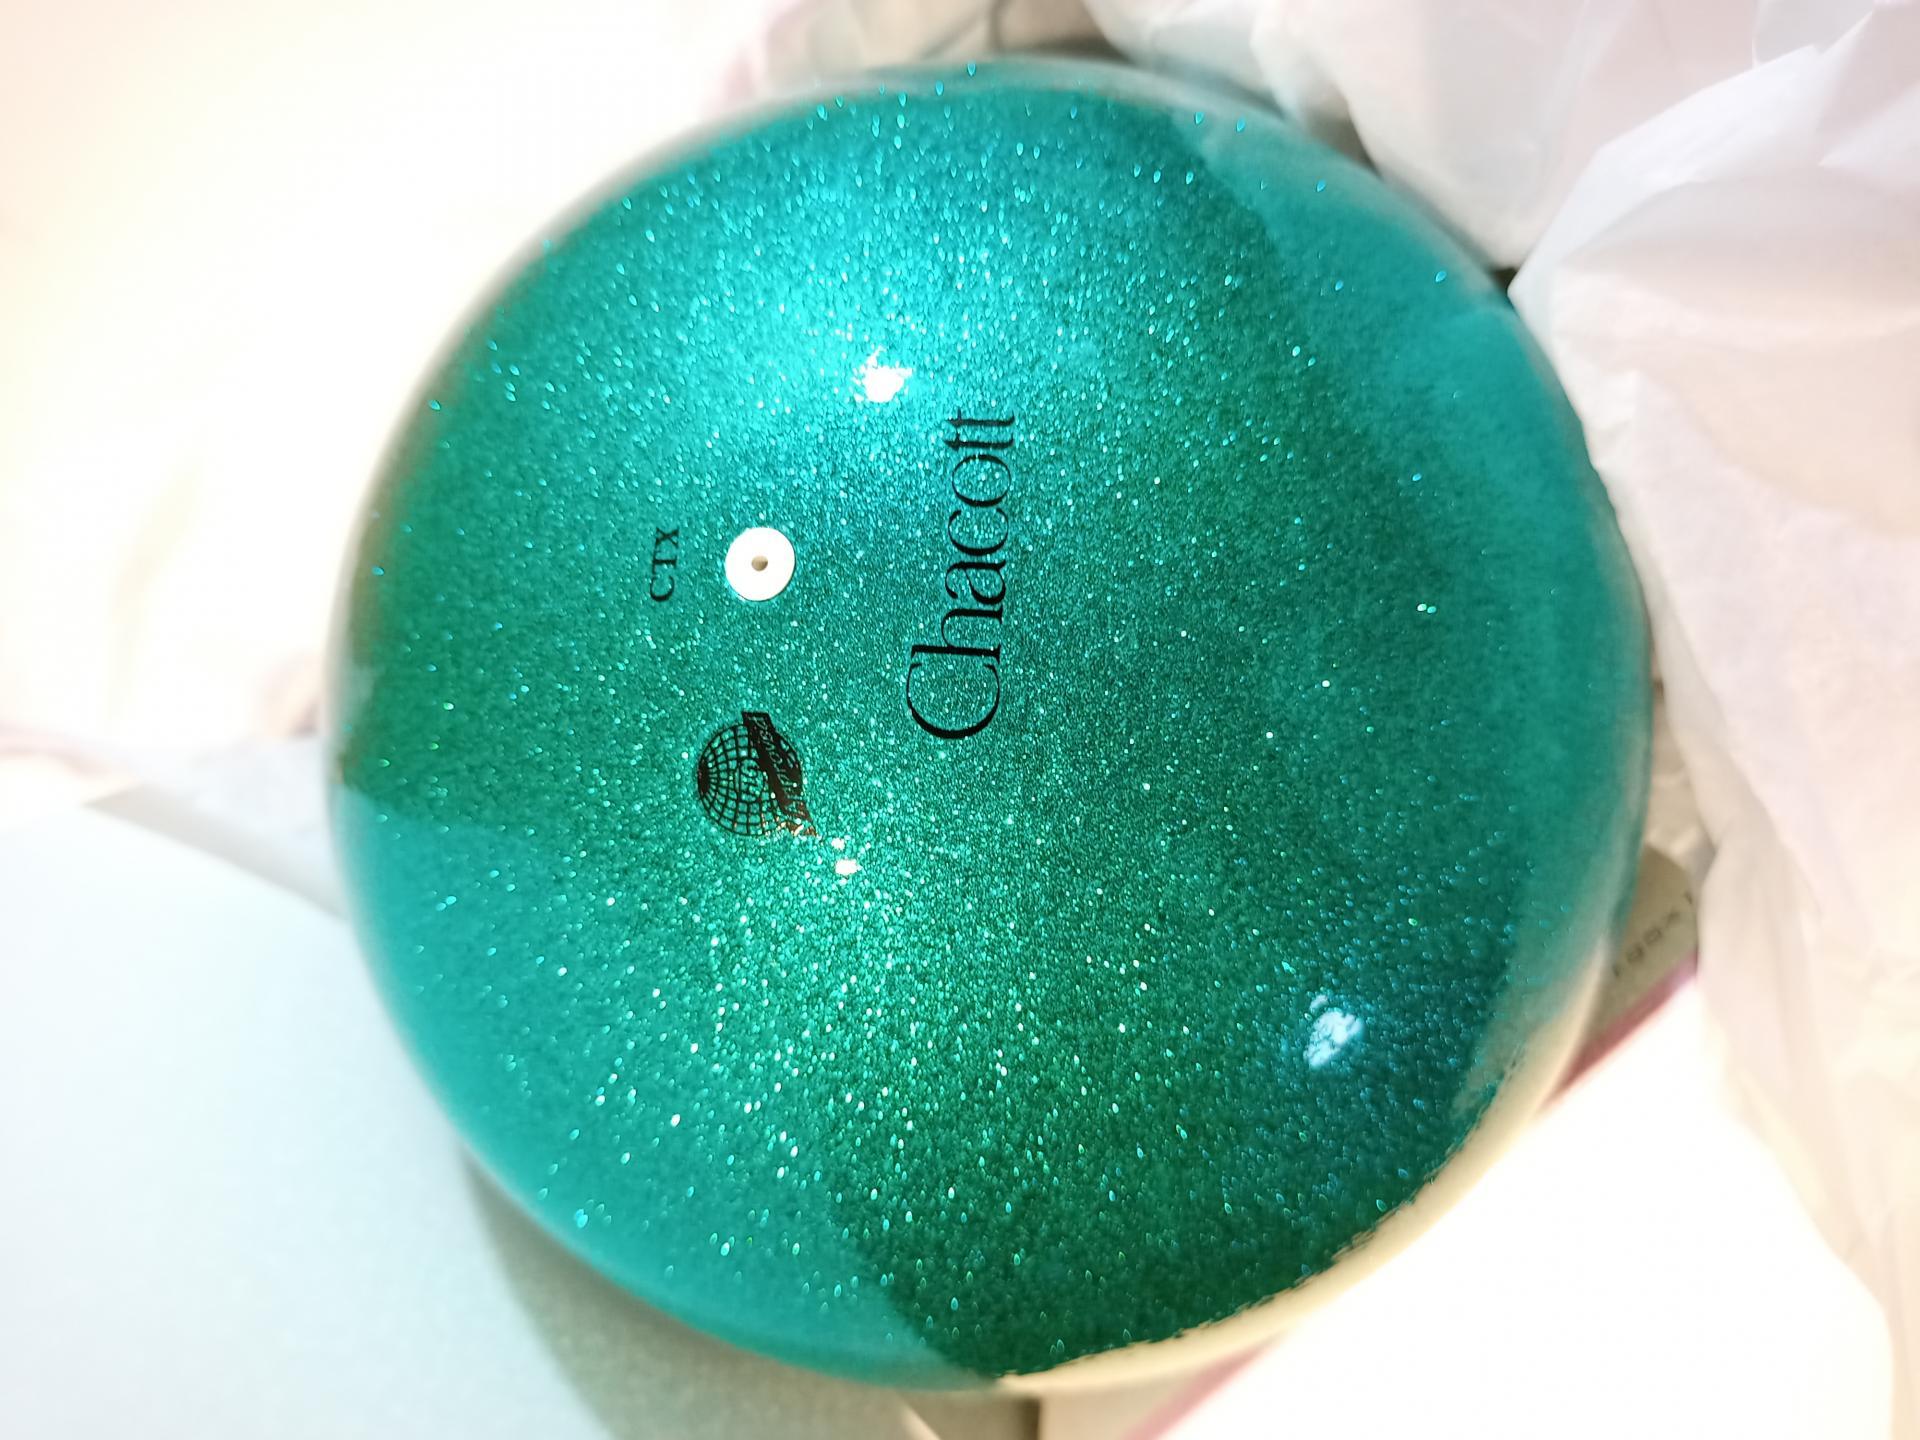 Pelota Chacott Jewelry Esmerald Green 537, 185mm